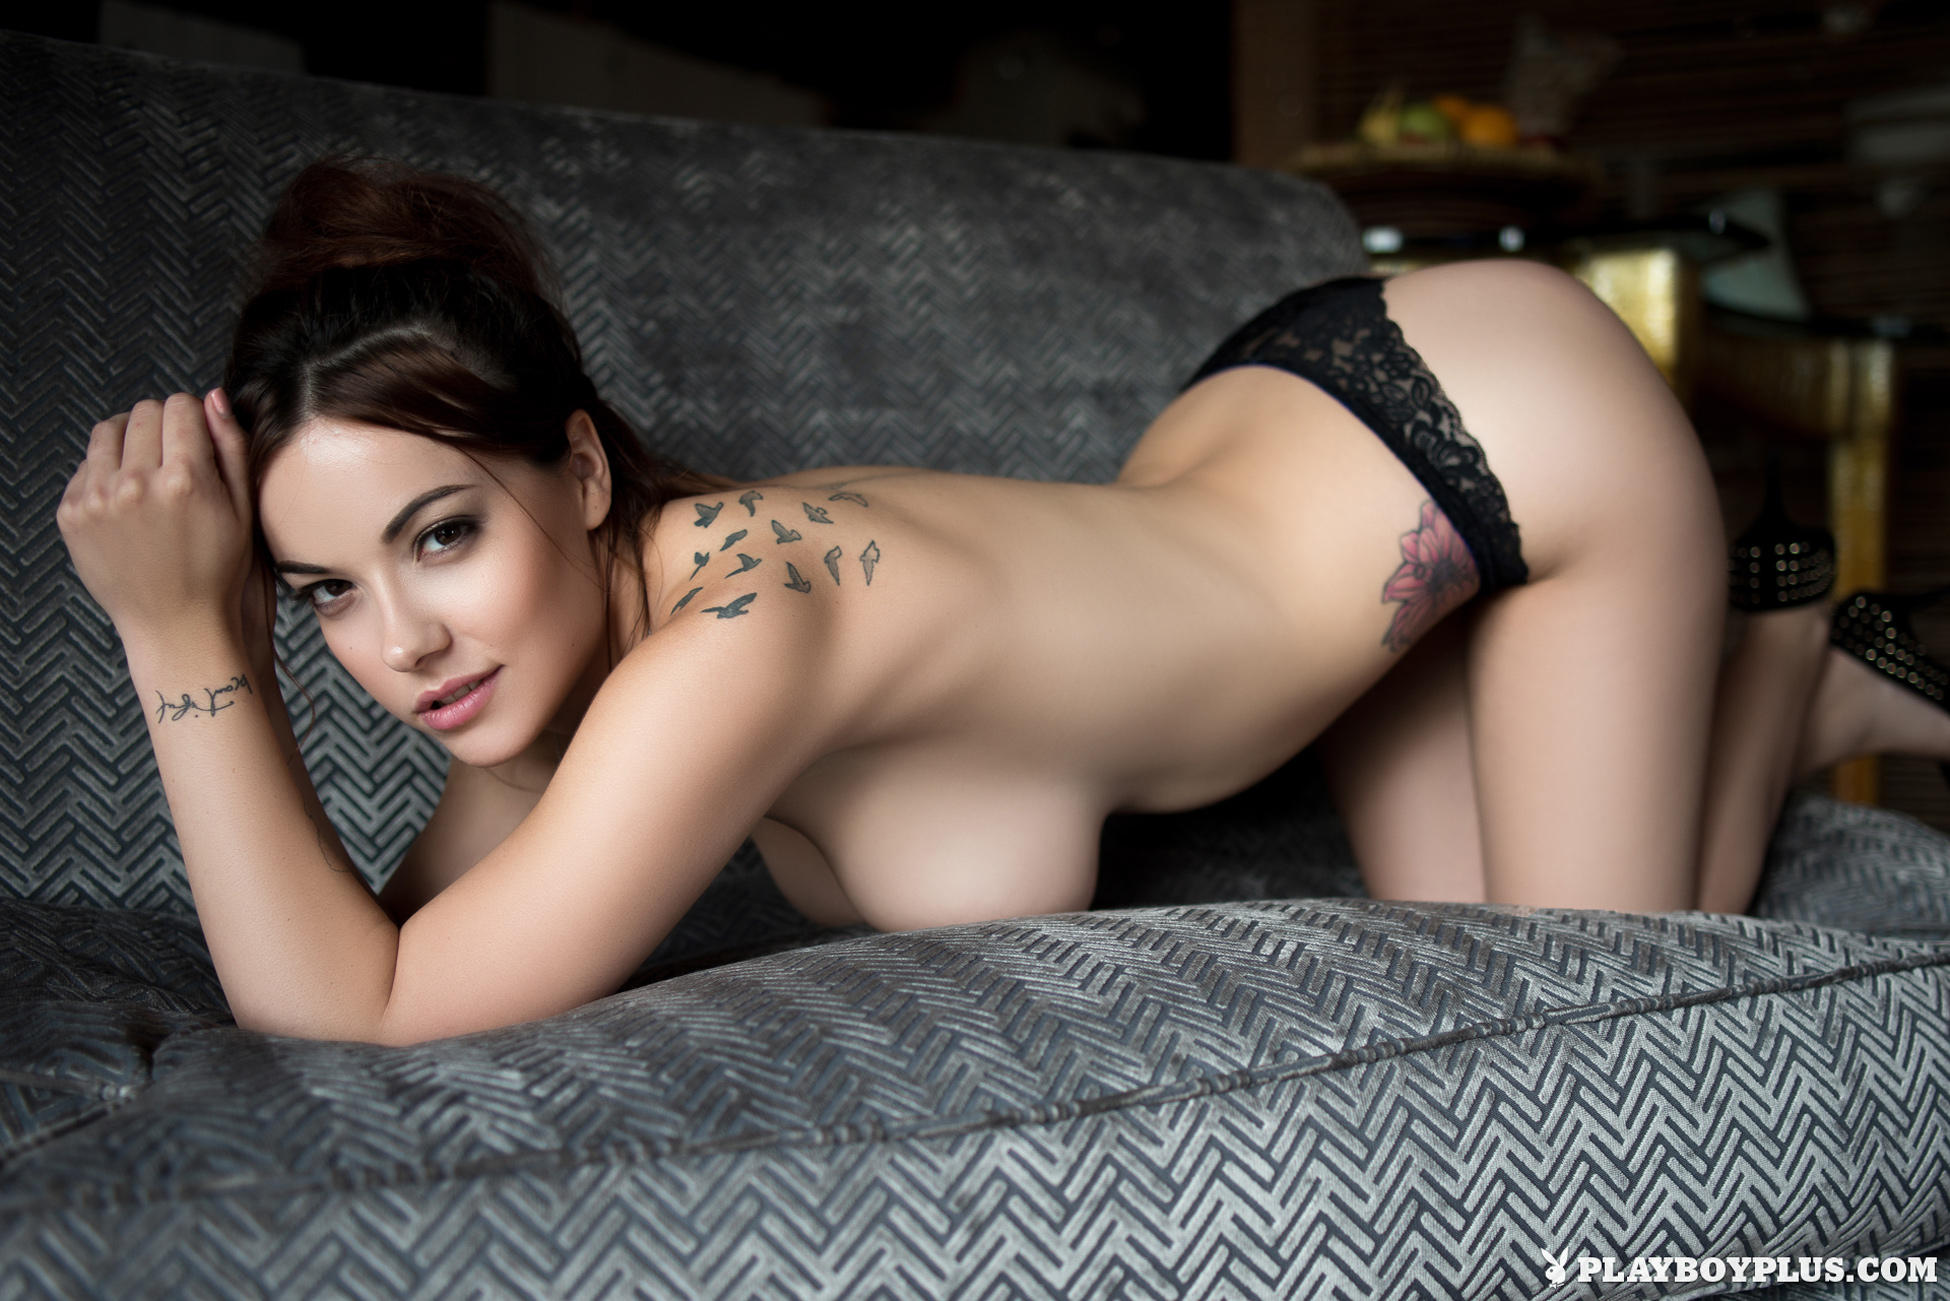 elizabeth-marxs-boobs-sofa-naked-playboy-09